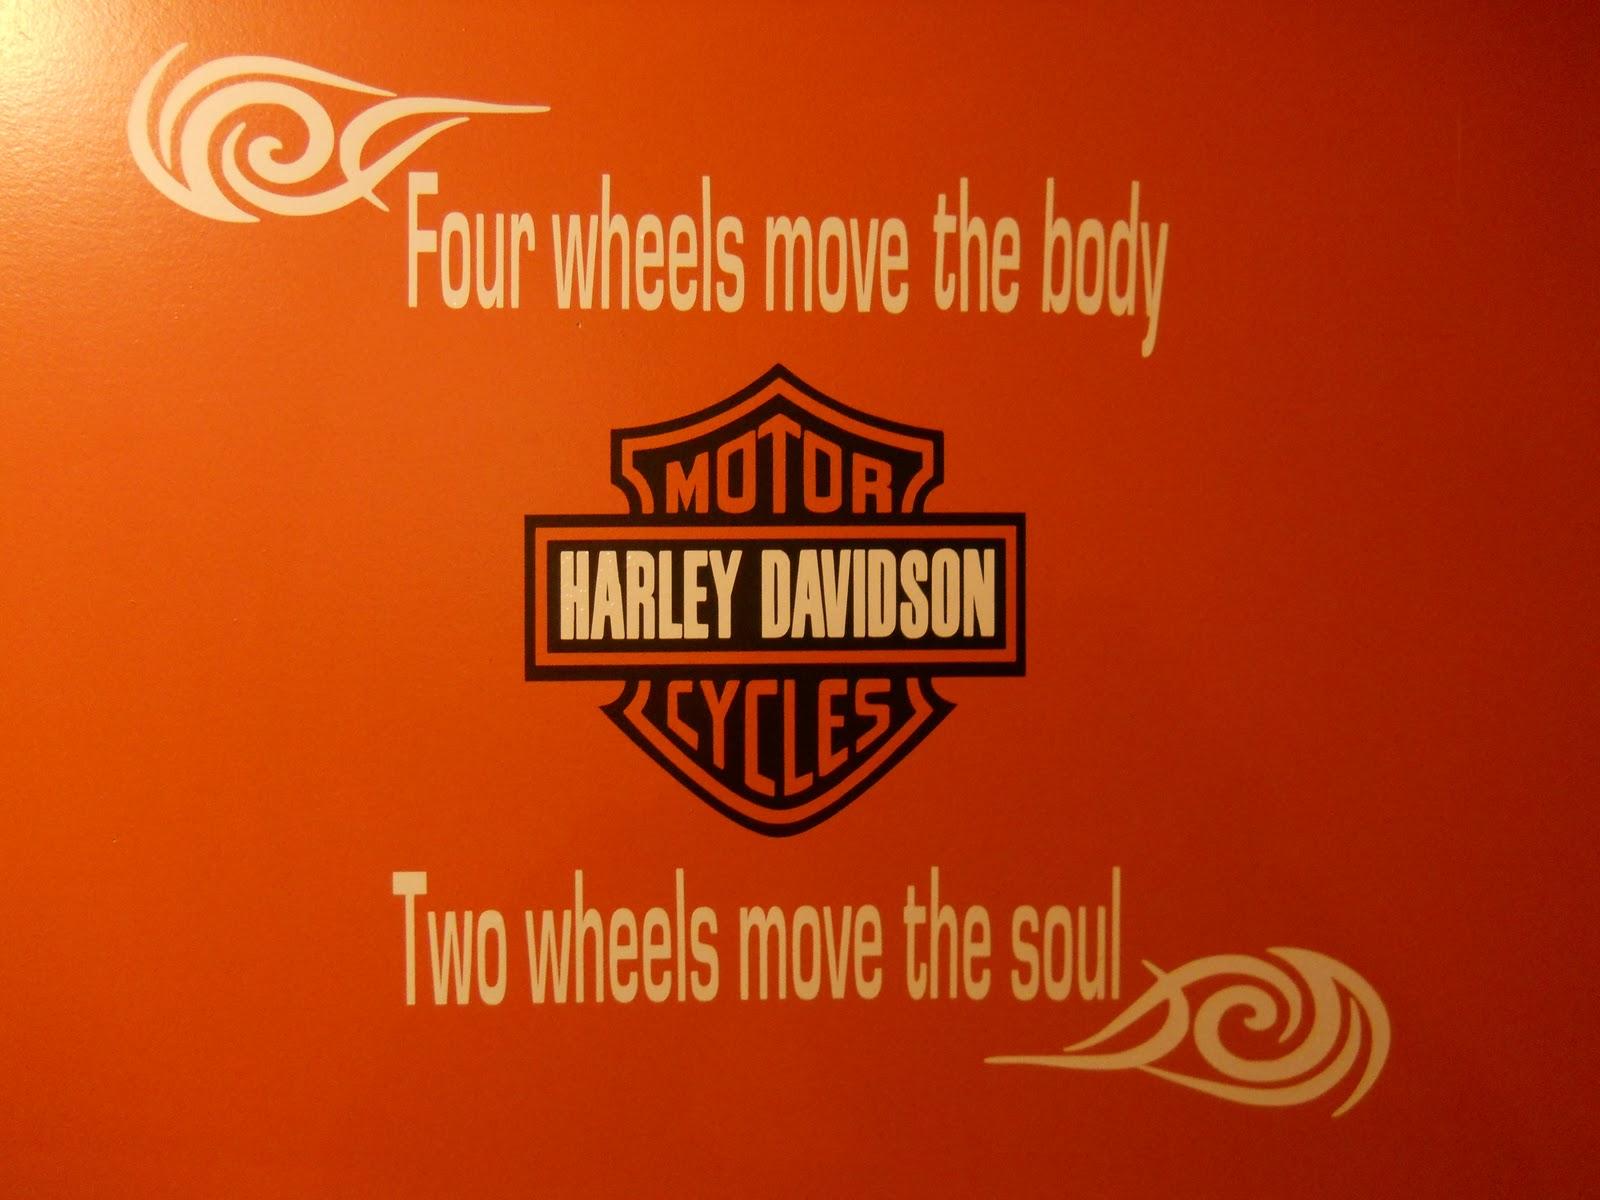 Harley Davidson Love Quotes Harley Davidson Quotes Classy Best 25 Harley Davidson Quotes Ideas